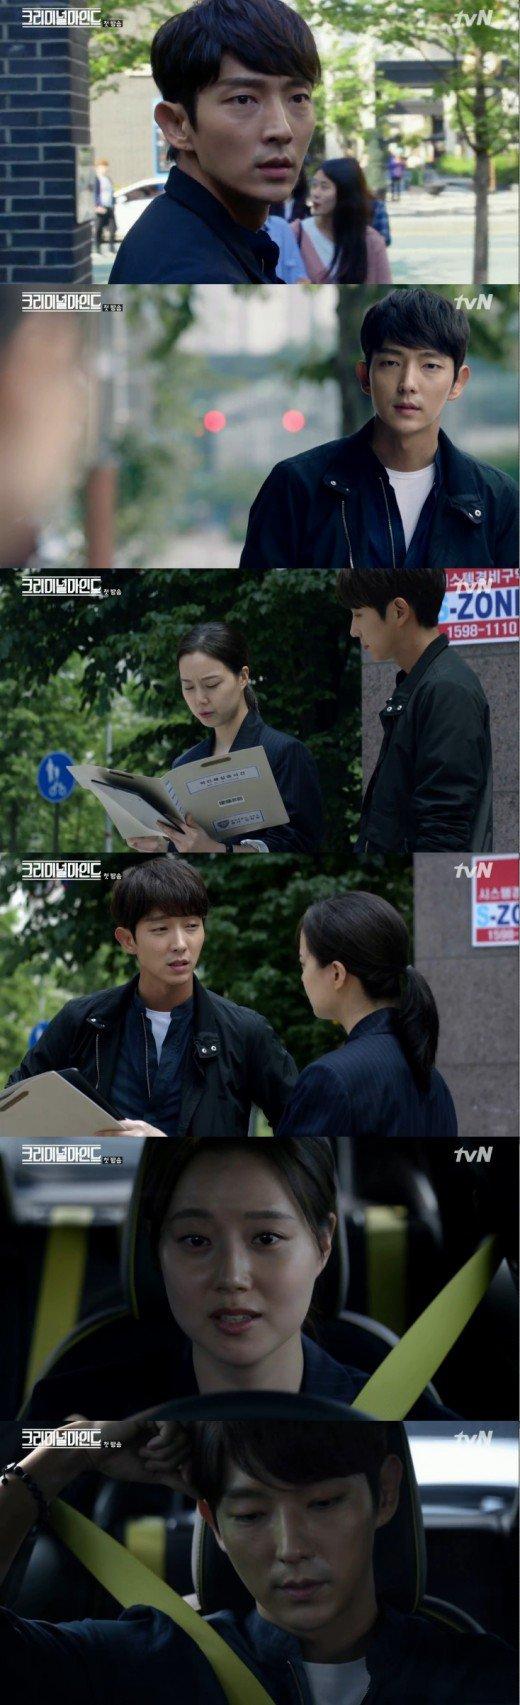 """Criminal Minds"" Lee Joon-gi and Moon Chae-won cooperate"